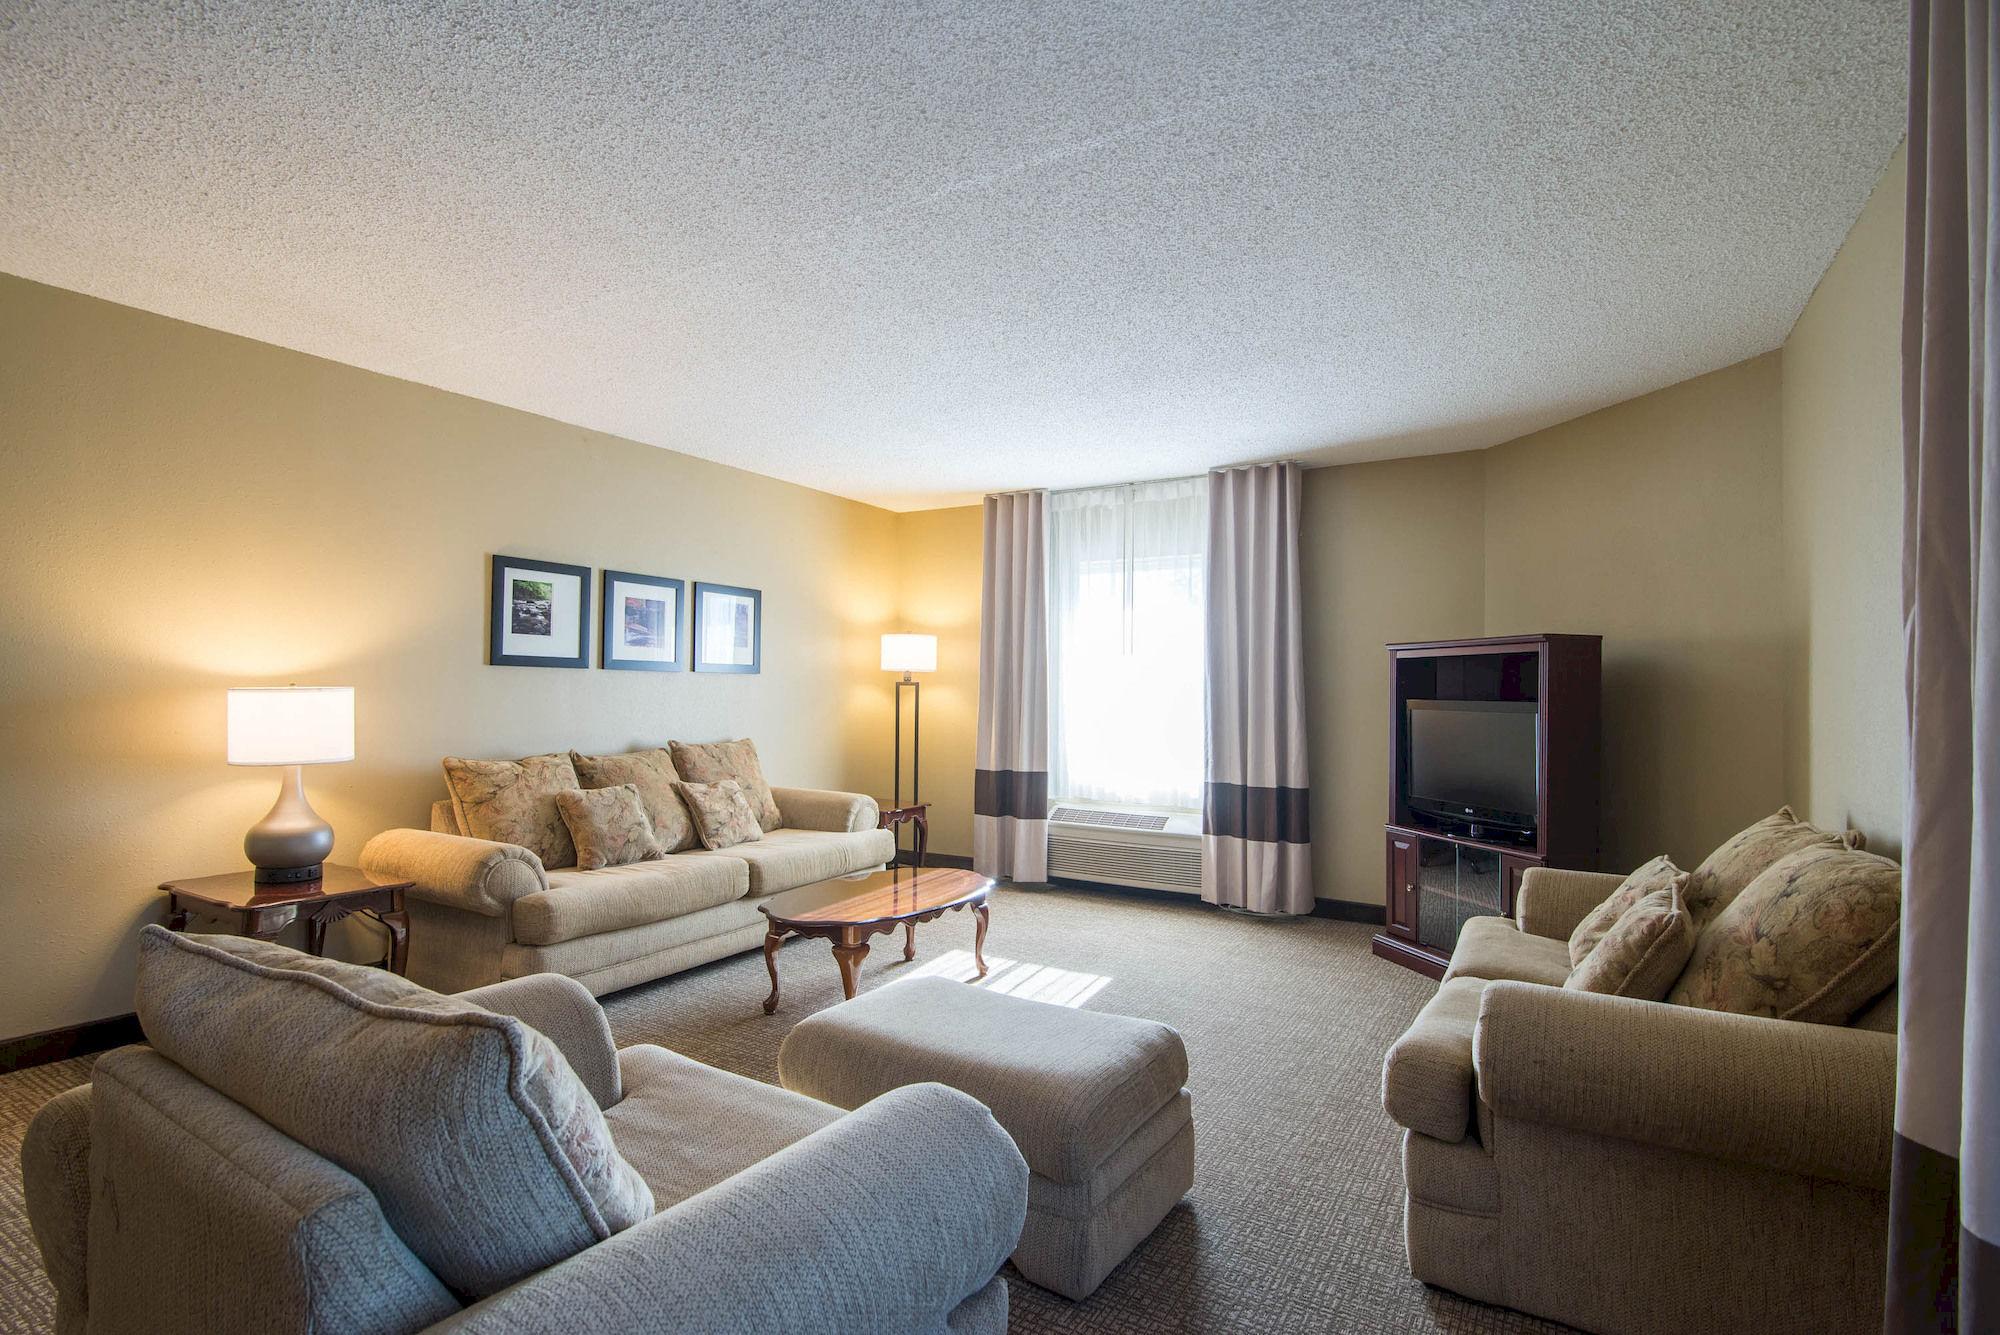 Comfort Inn & Suites Suwanee in Suwanee, GA